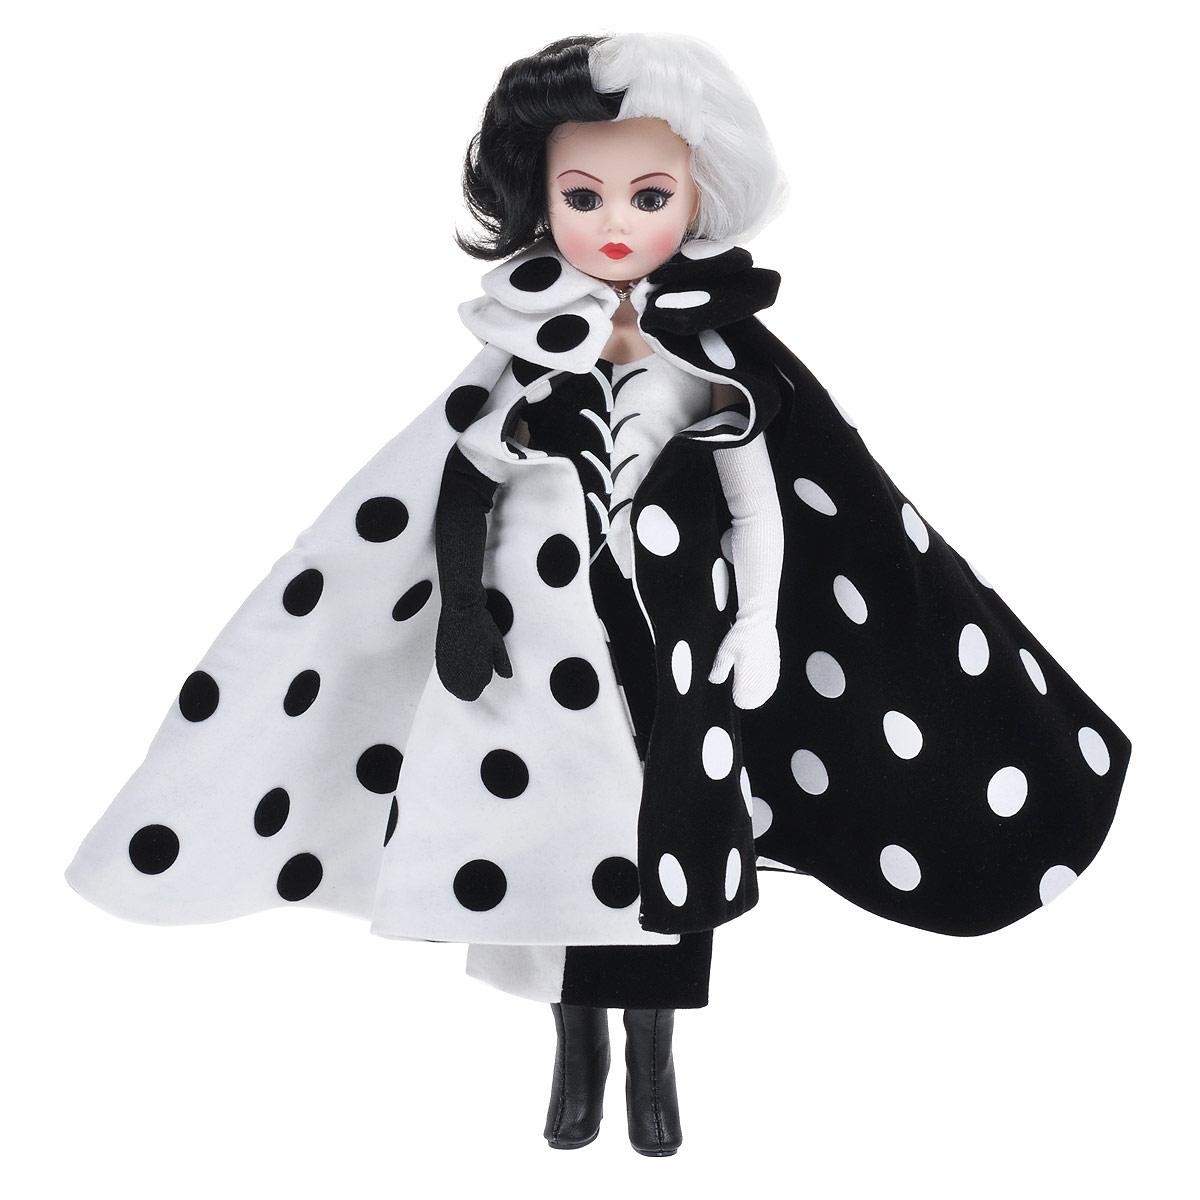 Madame Alexander Кукла Круэлла де Виль бокс рские перчатки с белым на краях